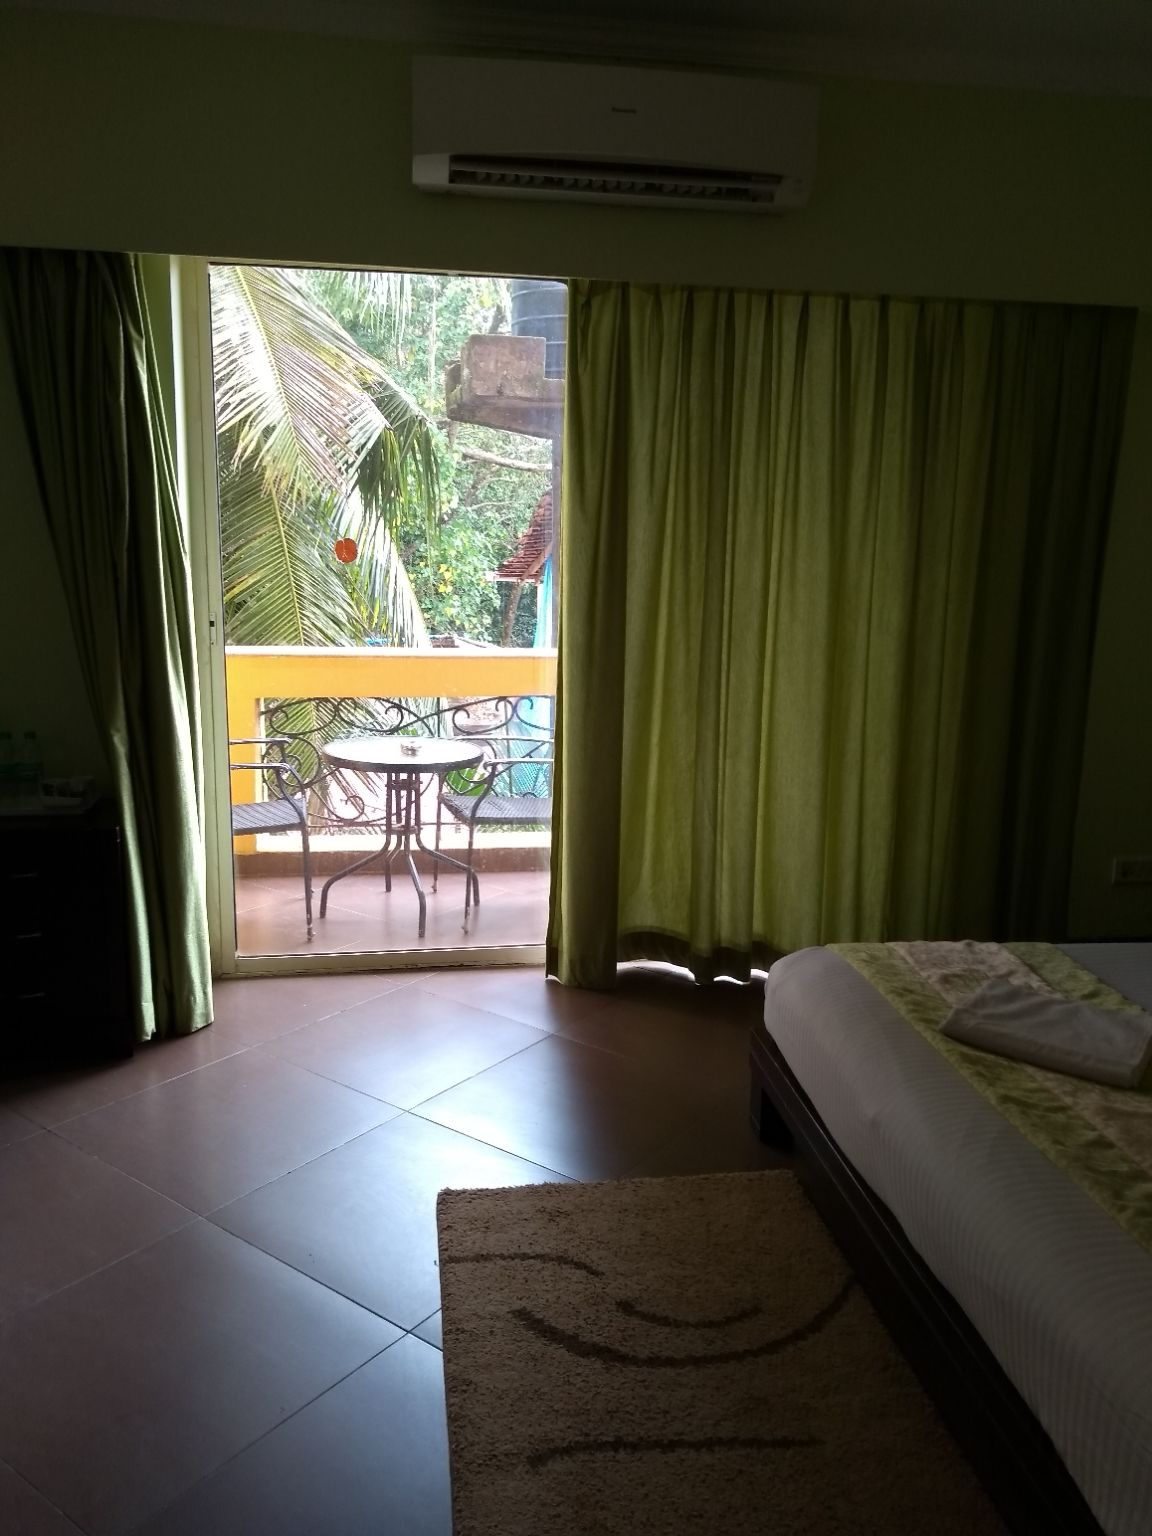 Photo of Goa By Neelima Sharan